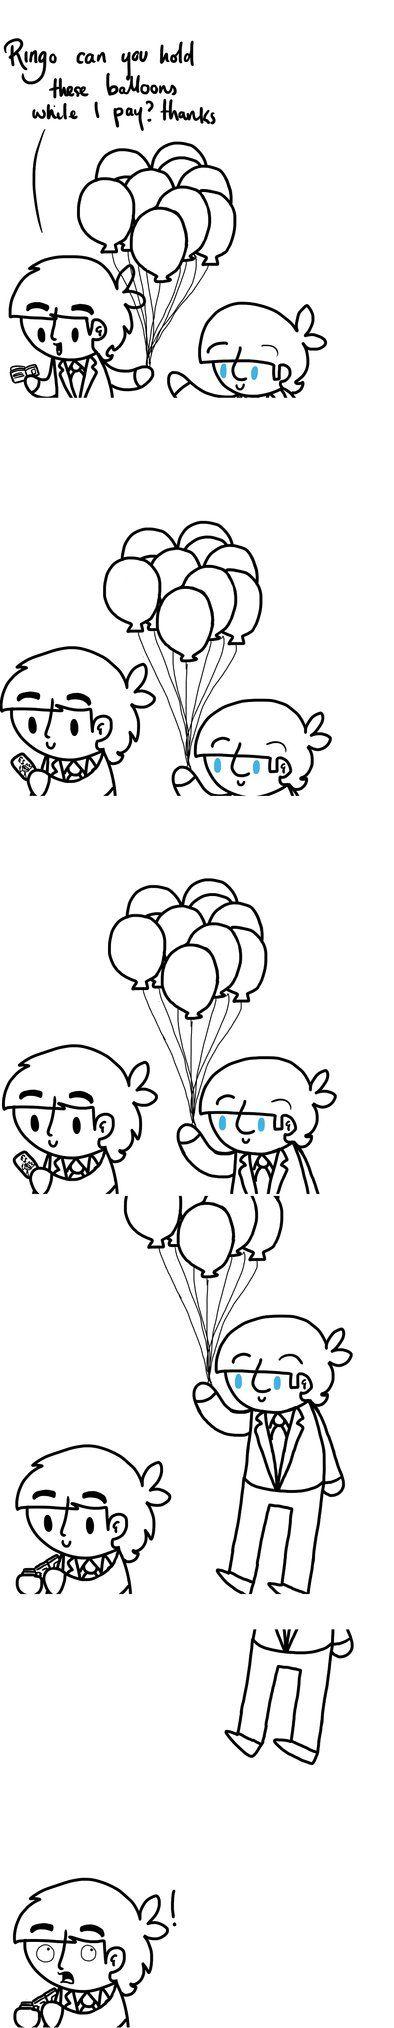 Balloons by ChazzyLlama on DeviantArt